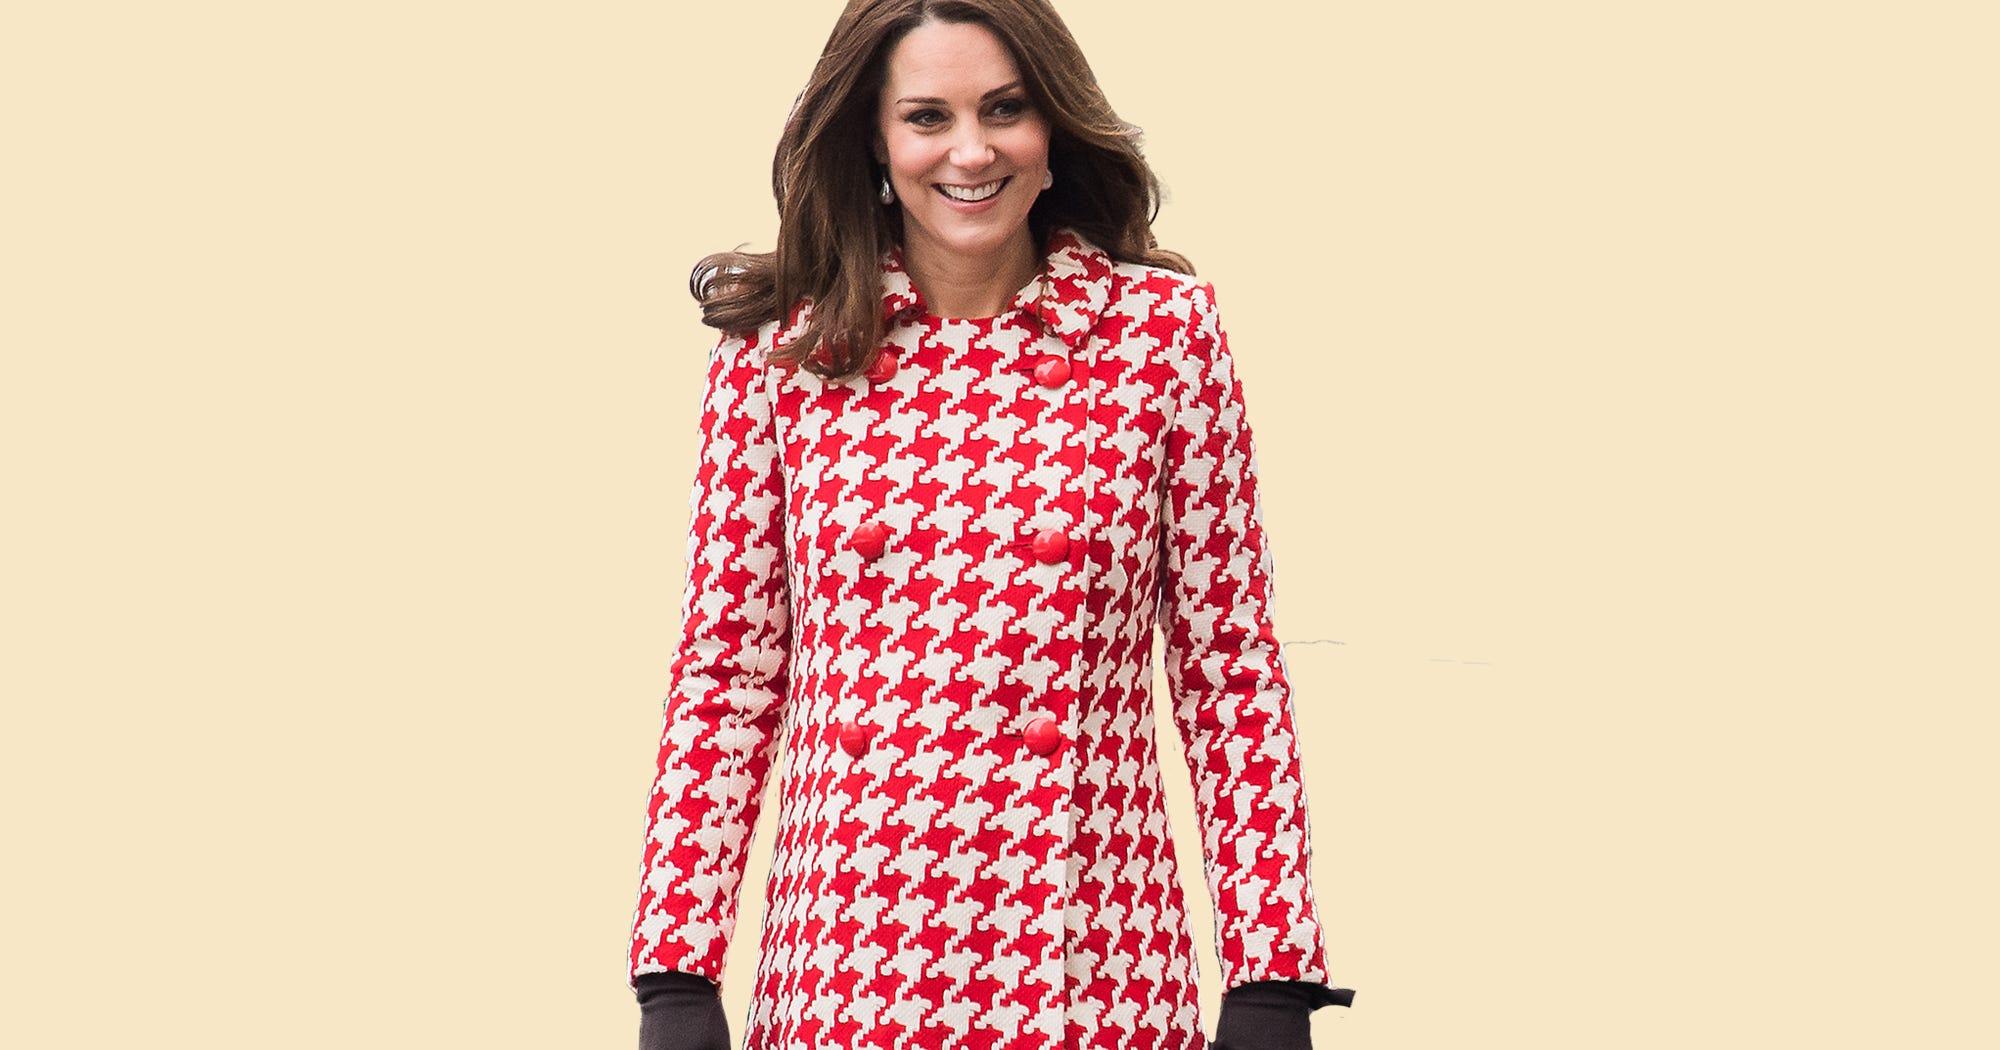 Clothes swap online uk